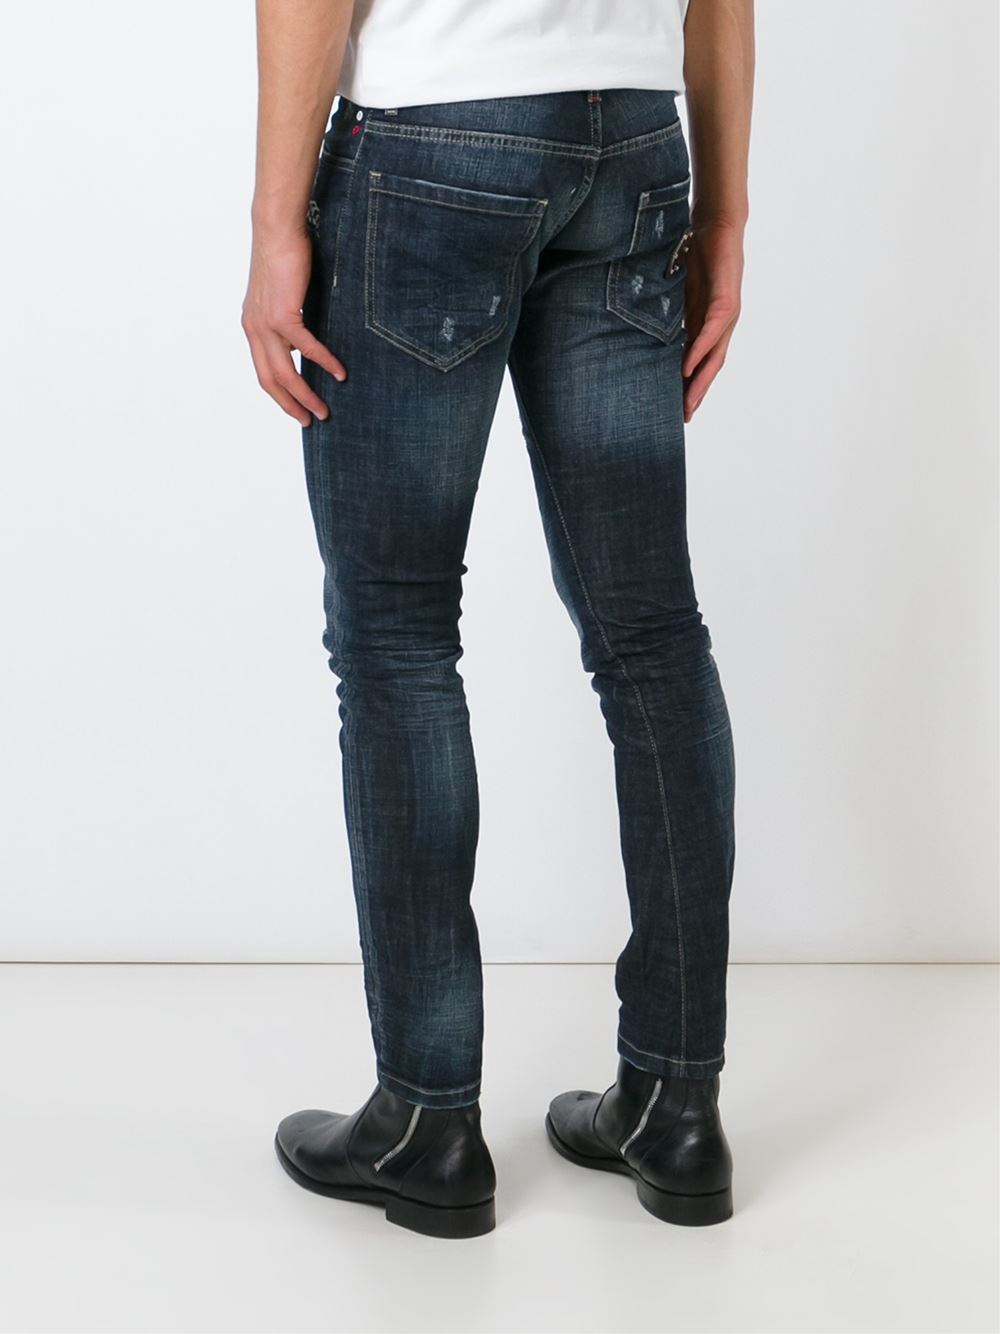 philipp plein skinny jeans in blue for men lyst. Black Bedroom Furniture Sets. Home Design Ideas